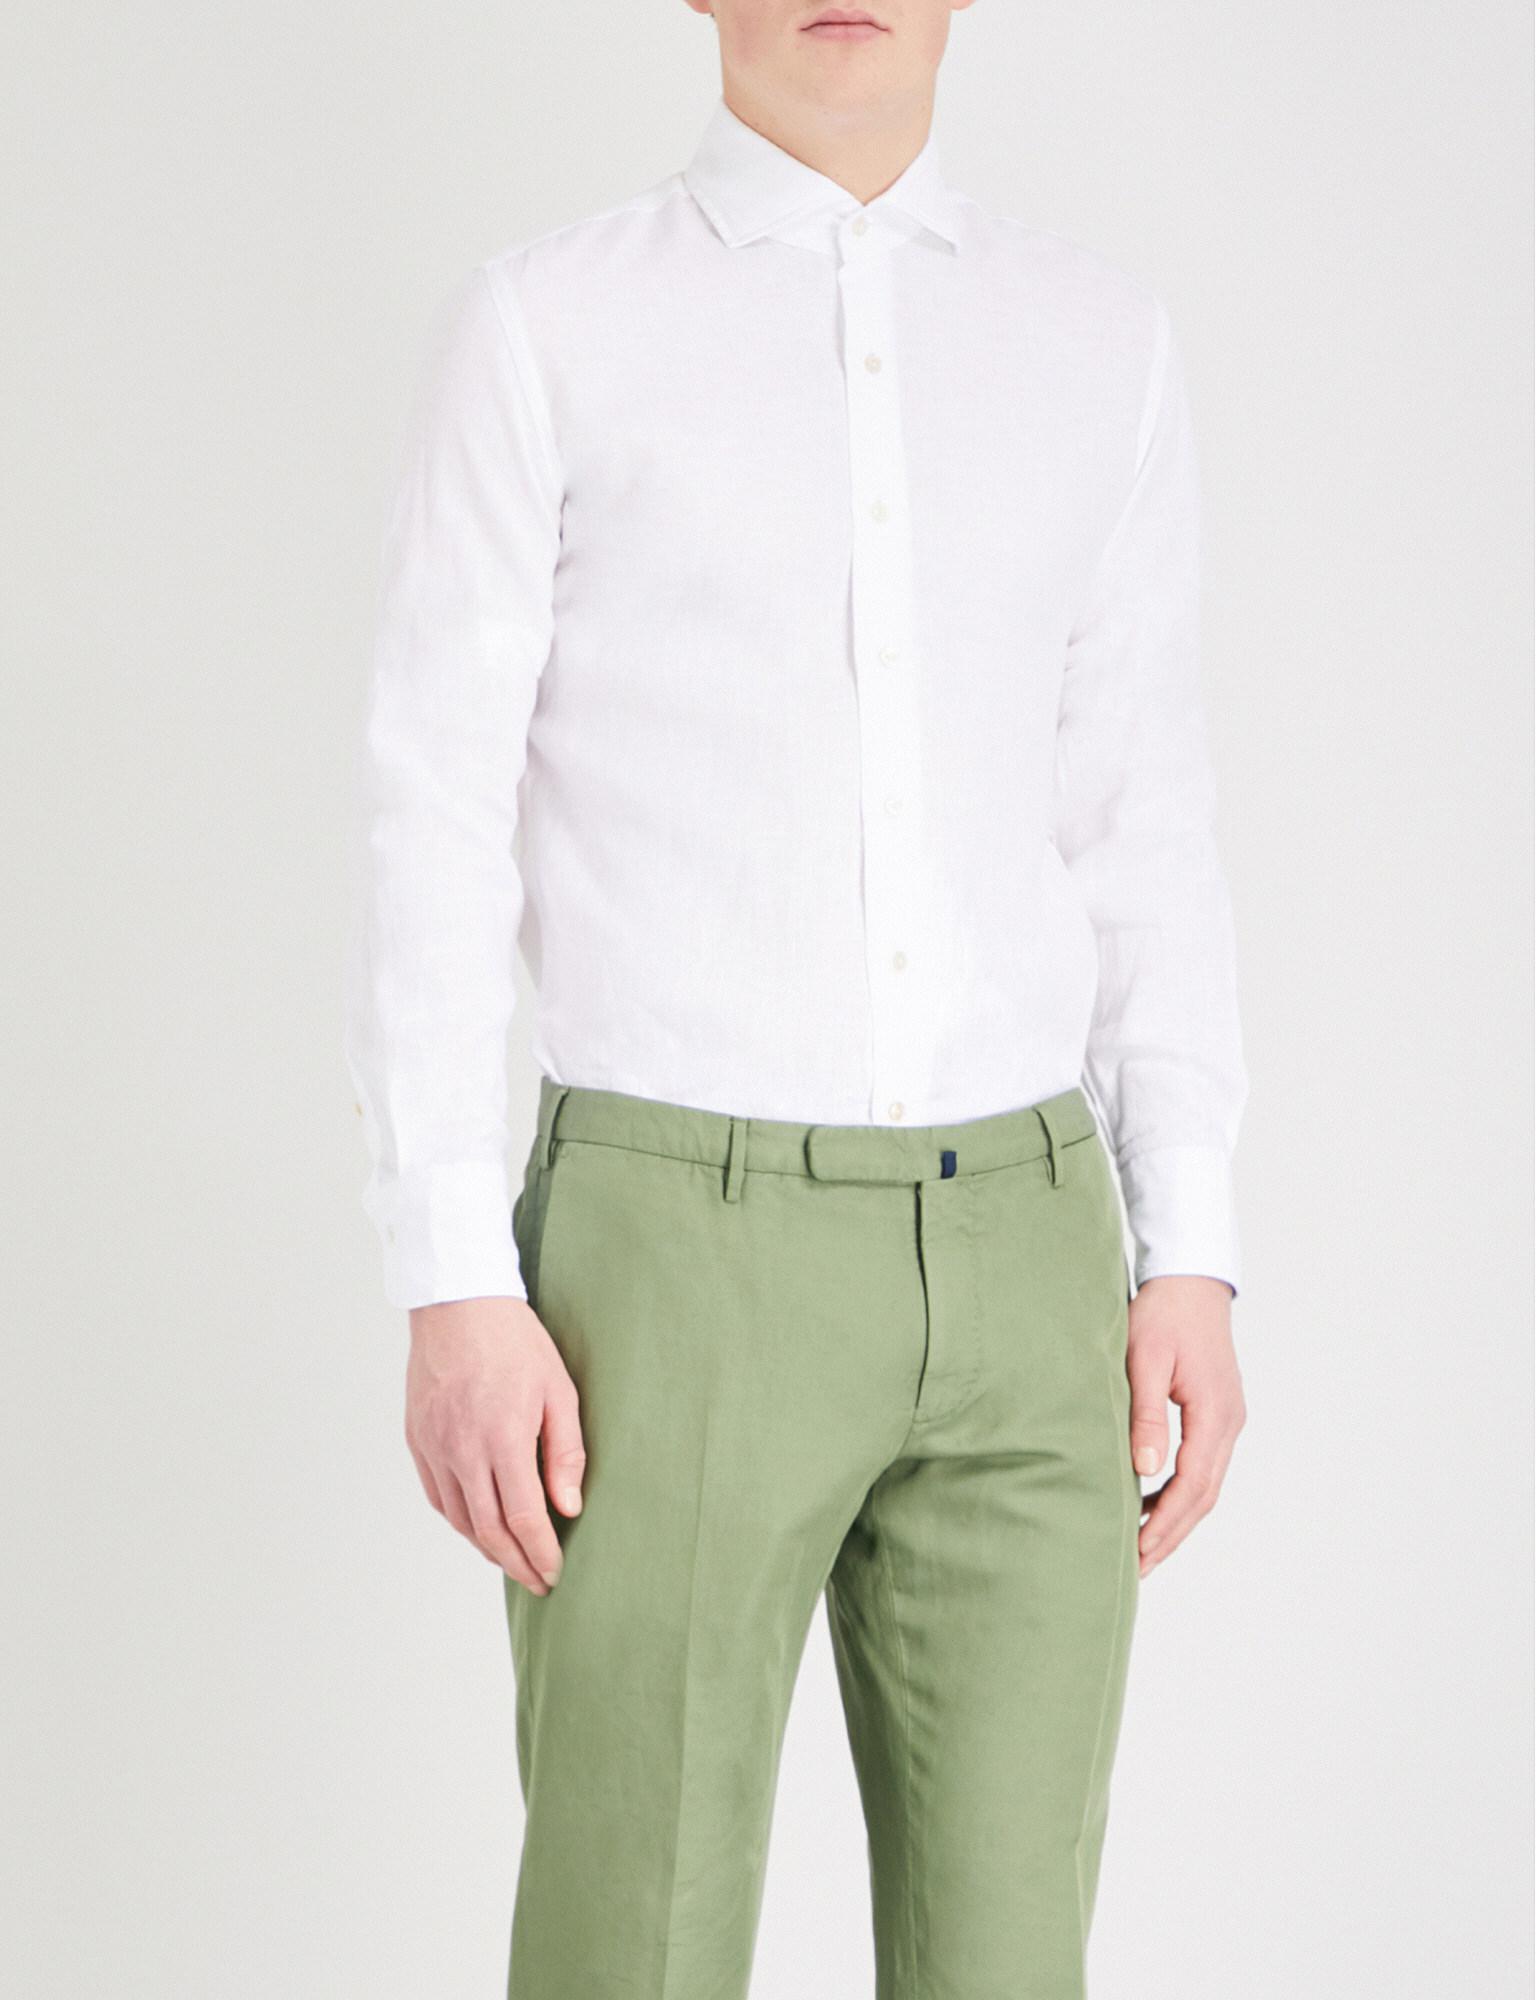 Lyst emmett london slim fit linen shirt in white for men for Slim fit white linen shirt